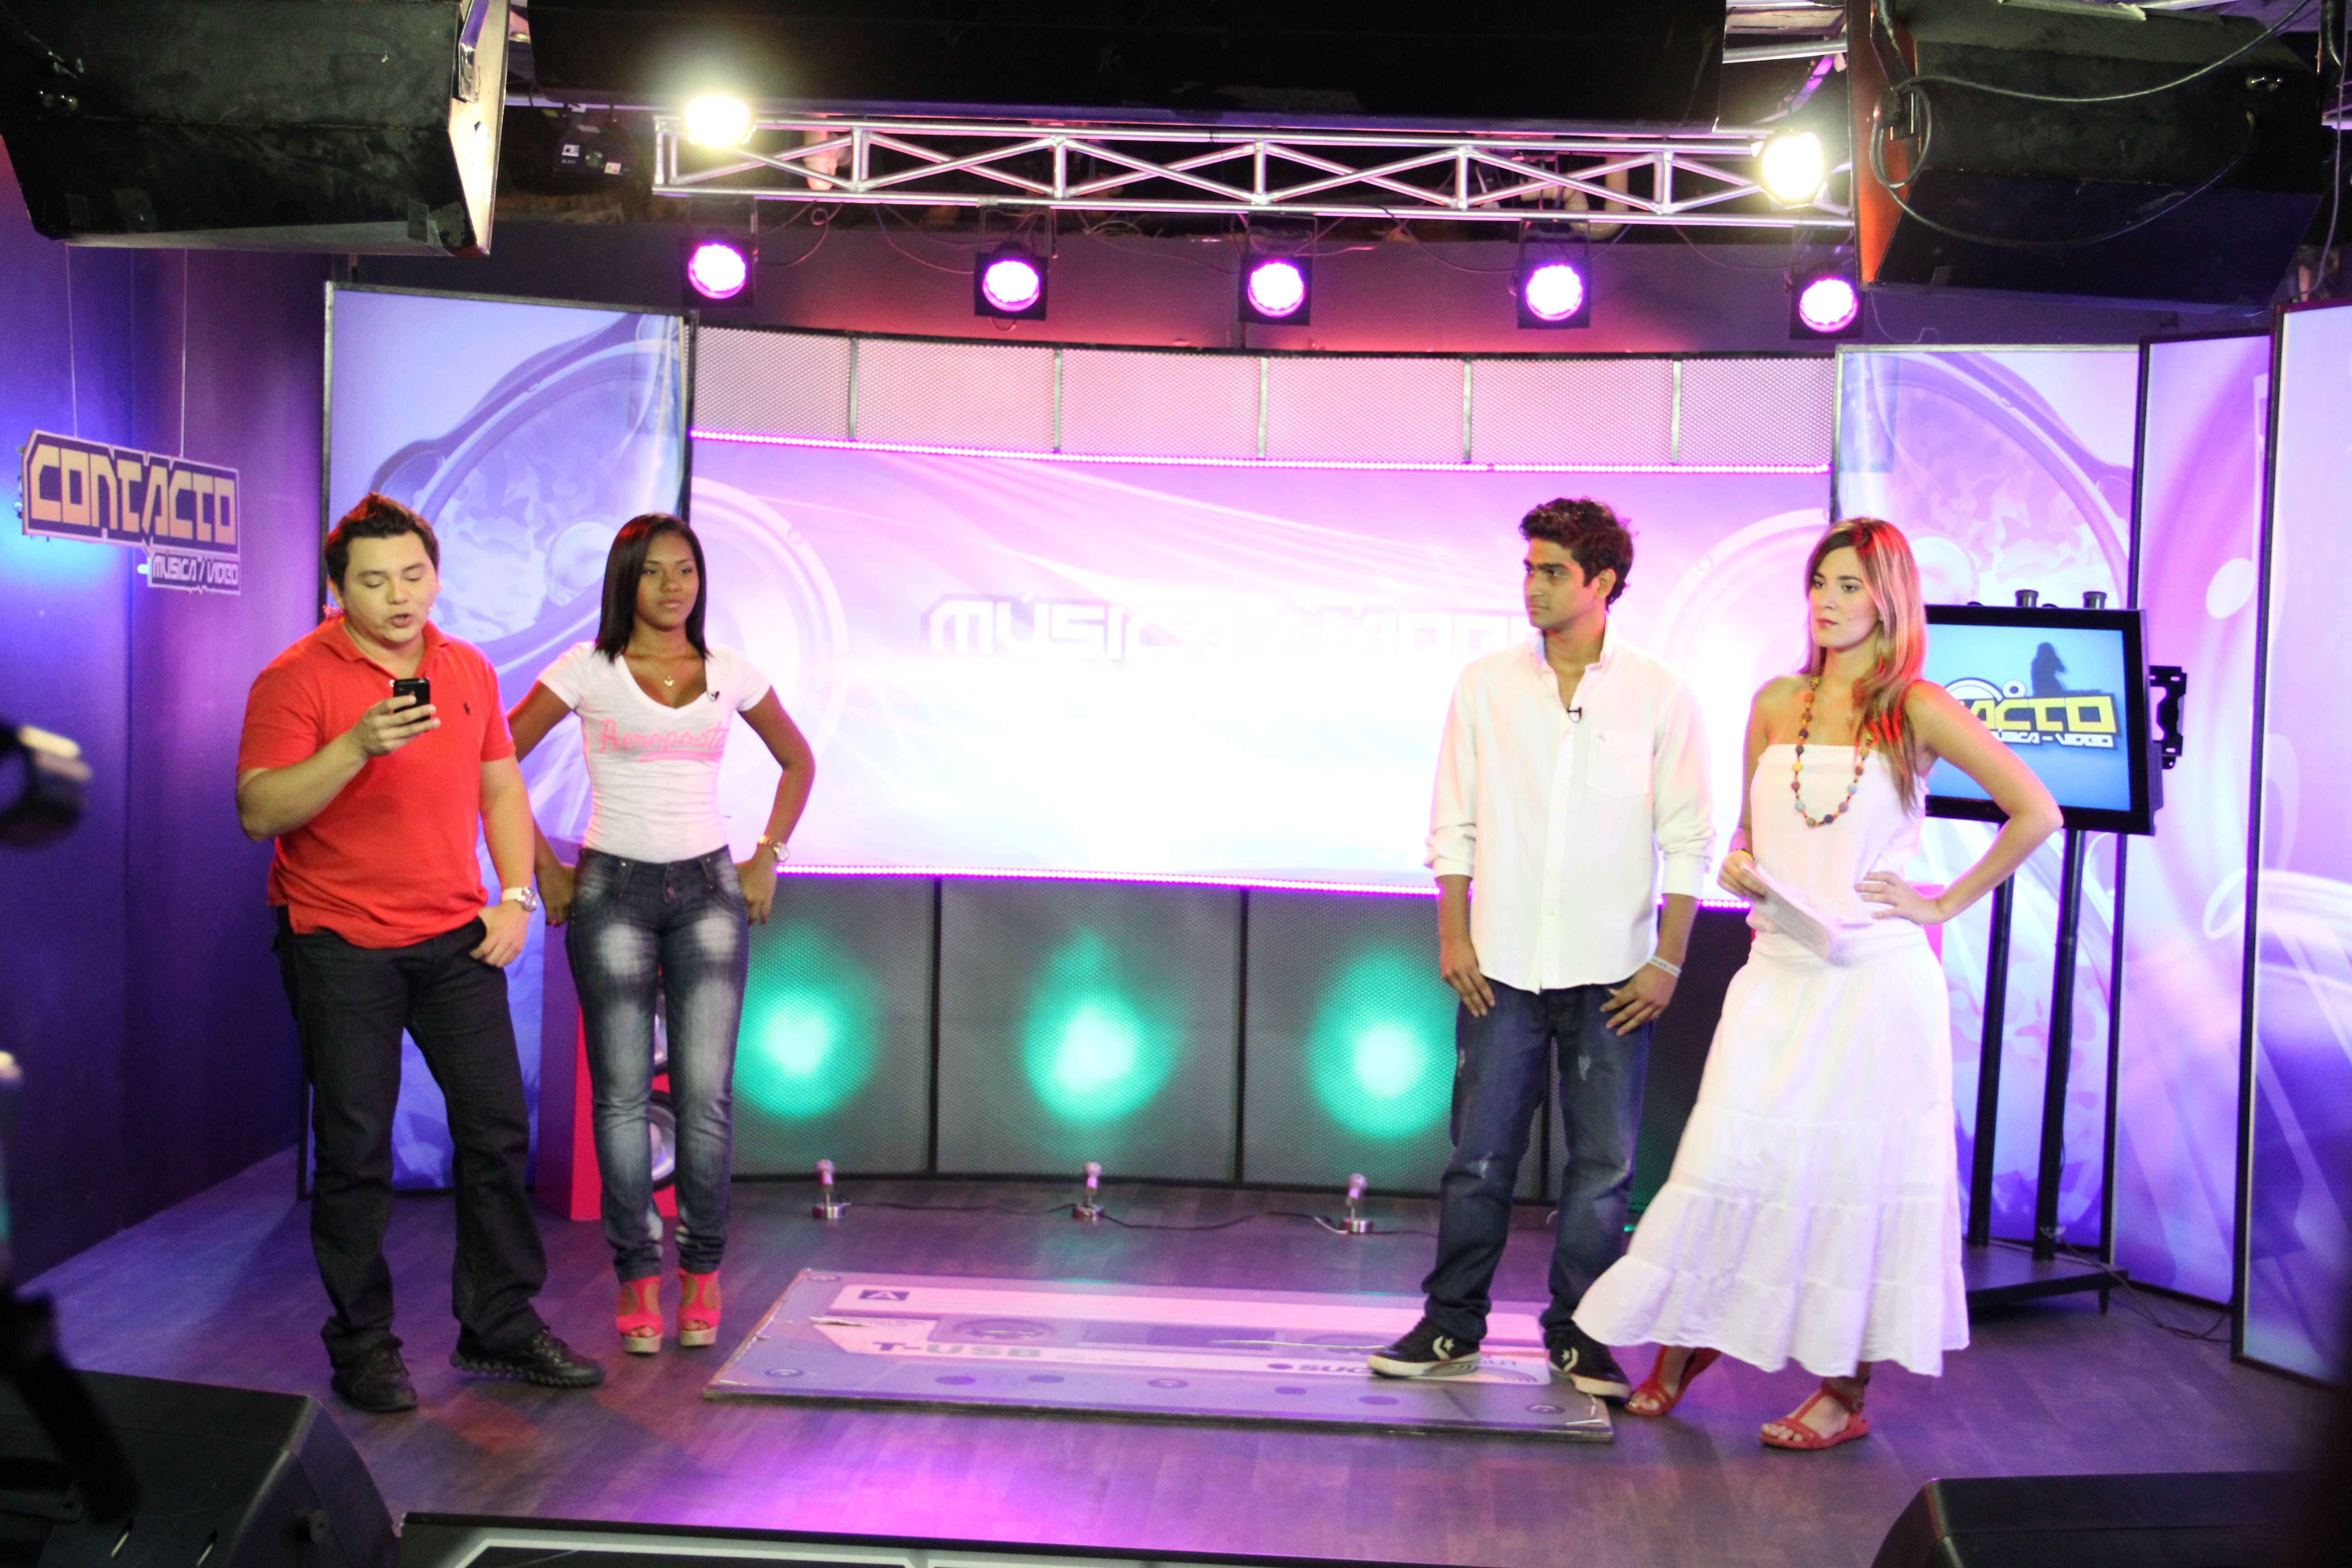 Factor 4: Procesos Académicos. Ruta académica a la ciudad de Barranquilla, instalación de Telecaribe. #Unicartagena #ComunicaciónSocial